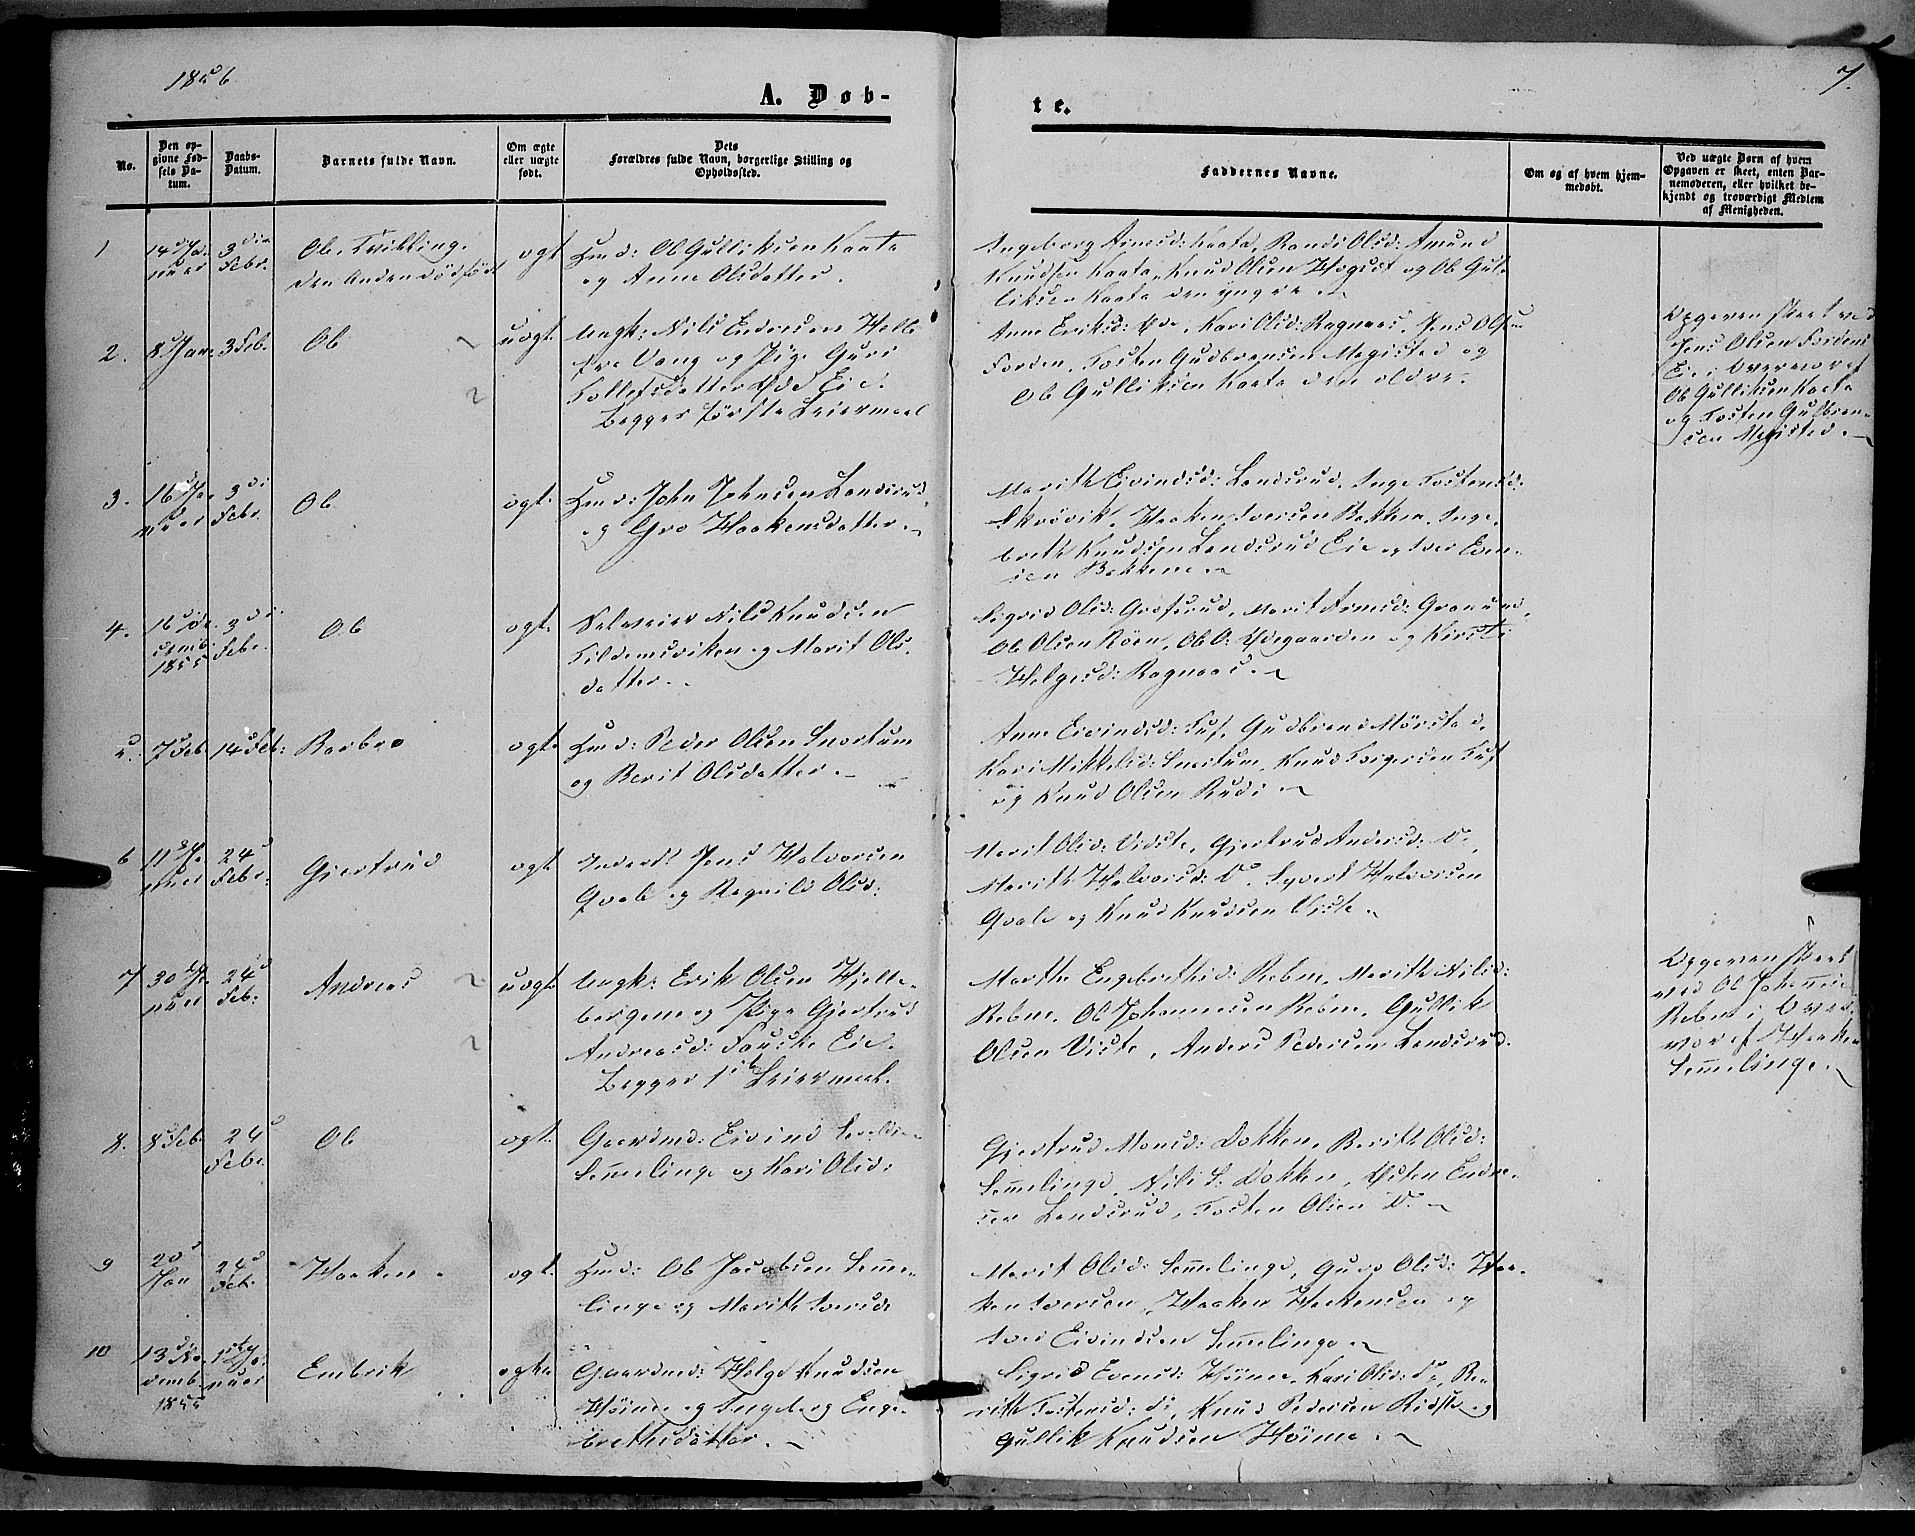 SAH, Vestre Slidre prestekontor, Ministerialbok nr. 2, 1856-1864, s. 7